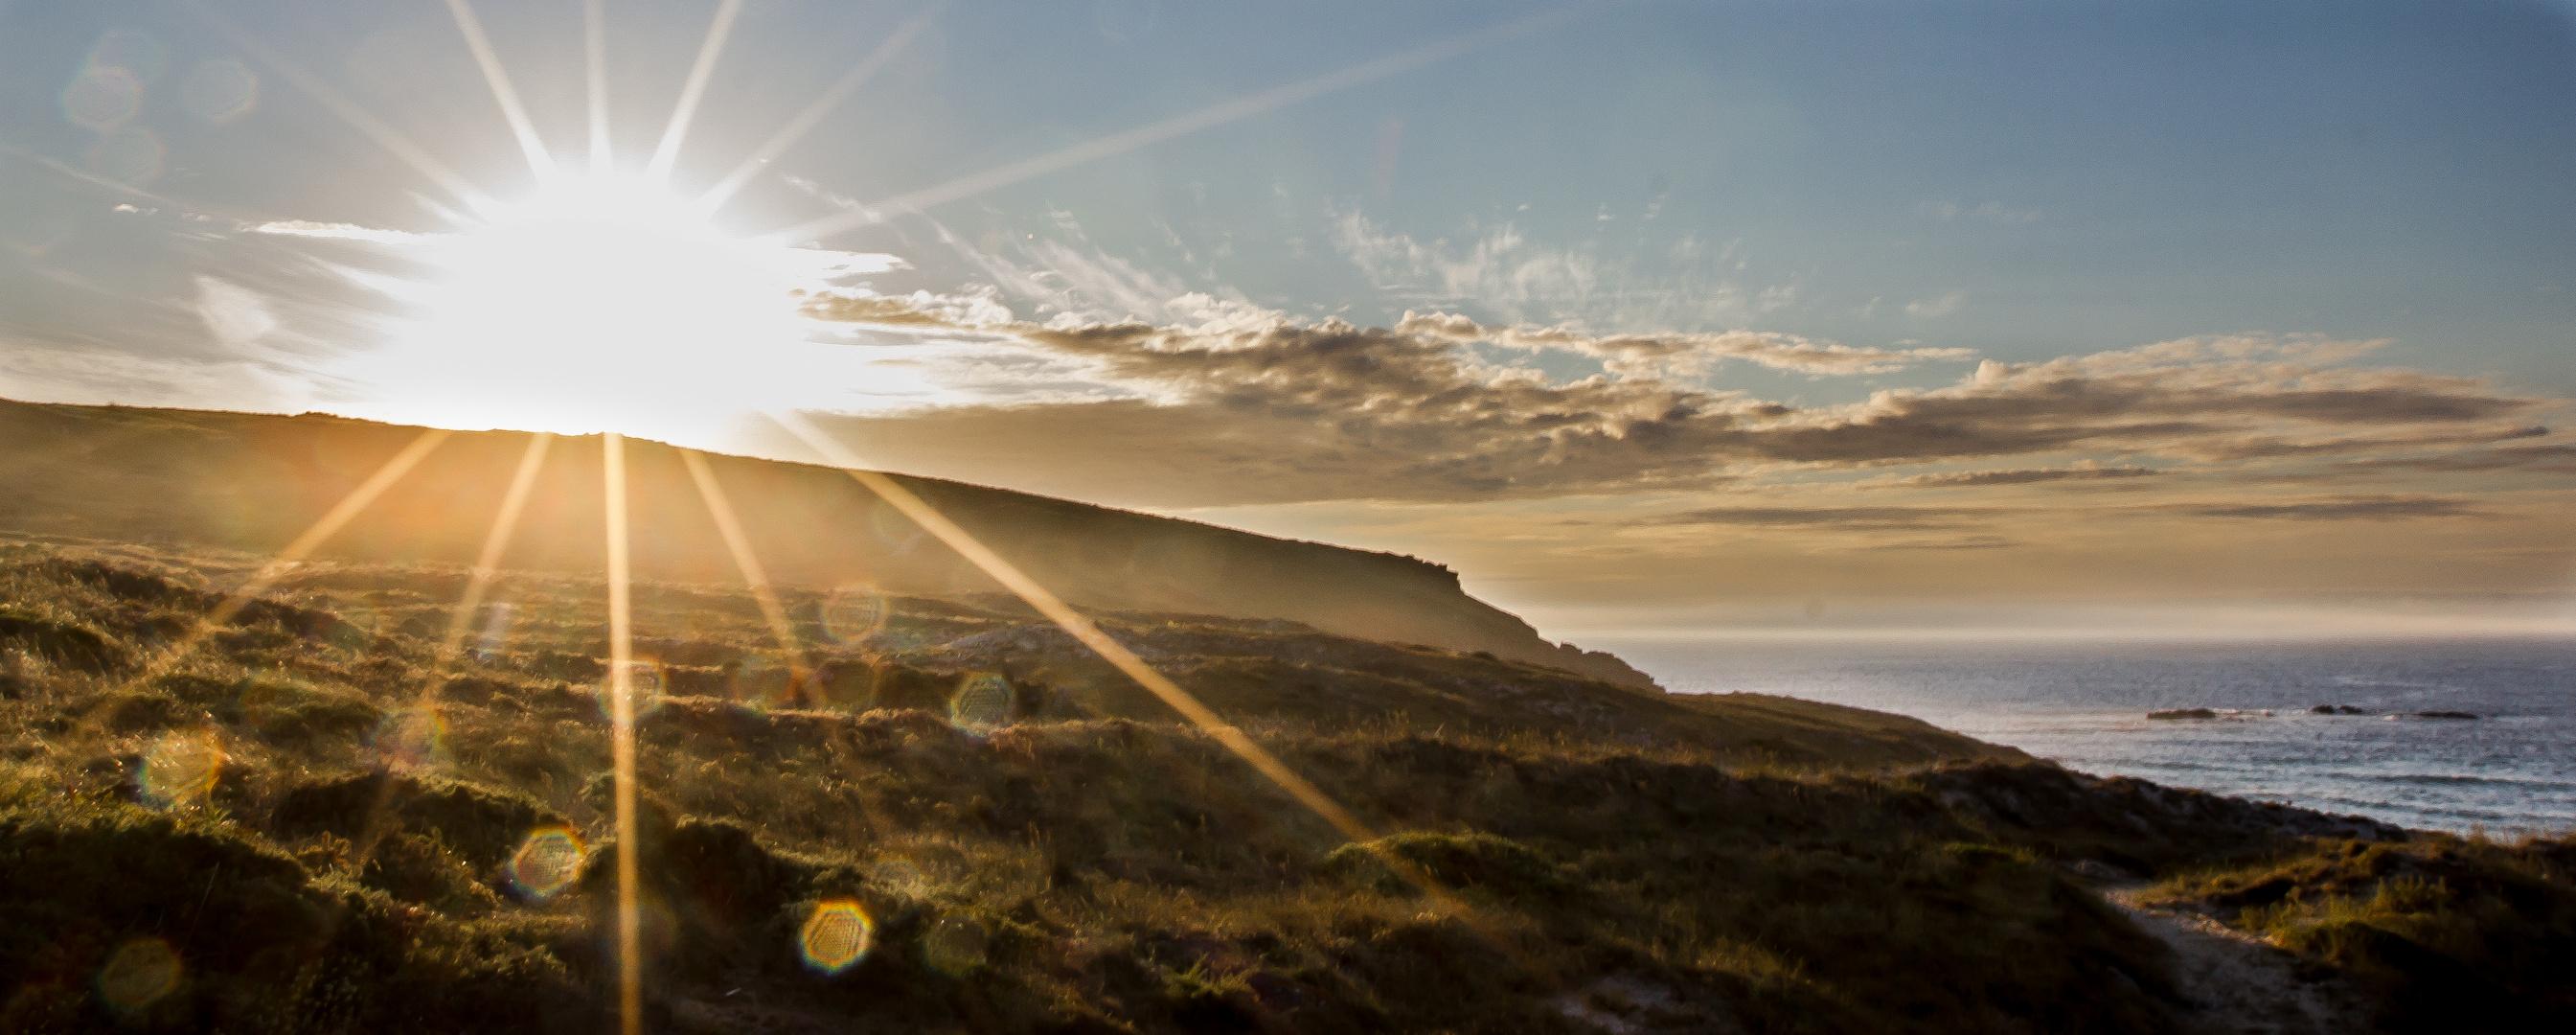 Sonnenuntergang am Playa Rostro/ Galicien